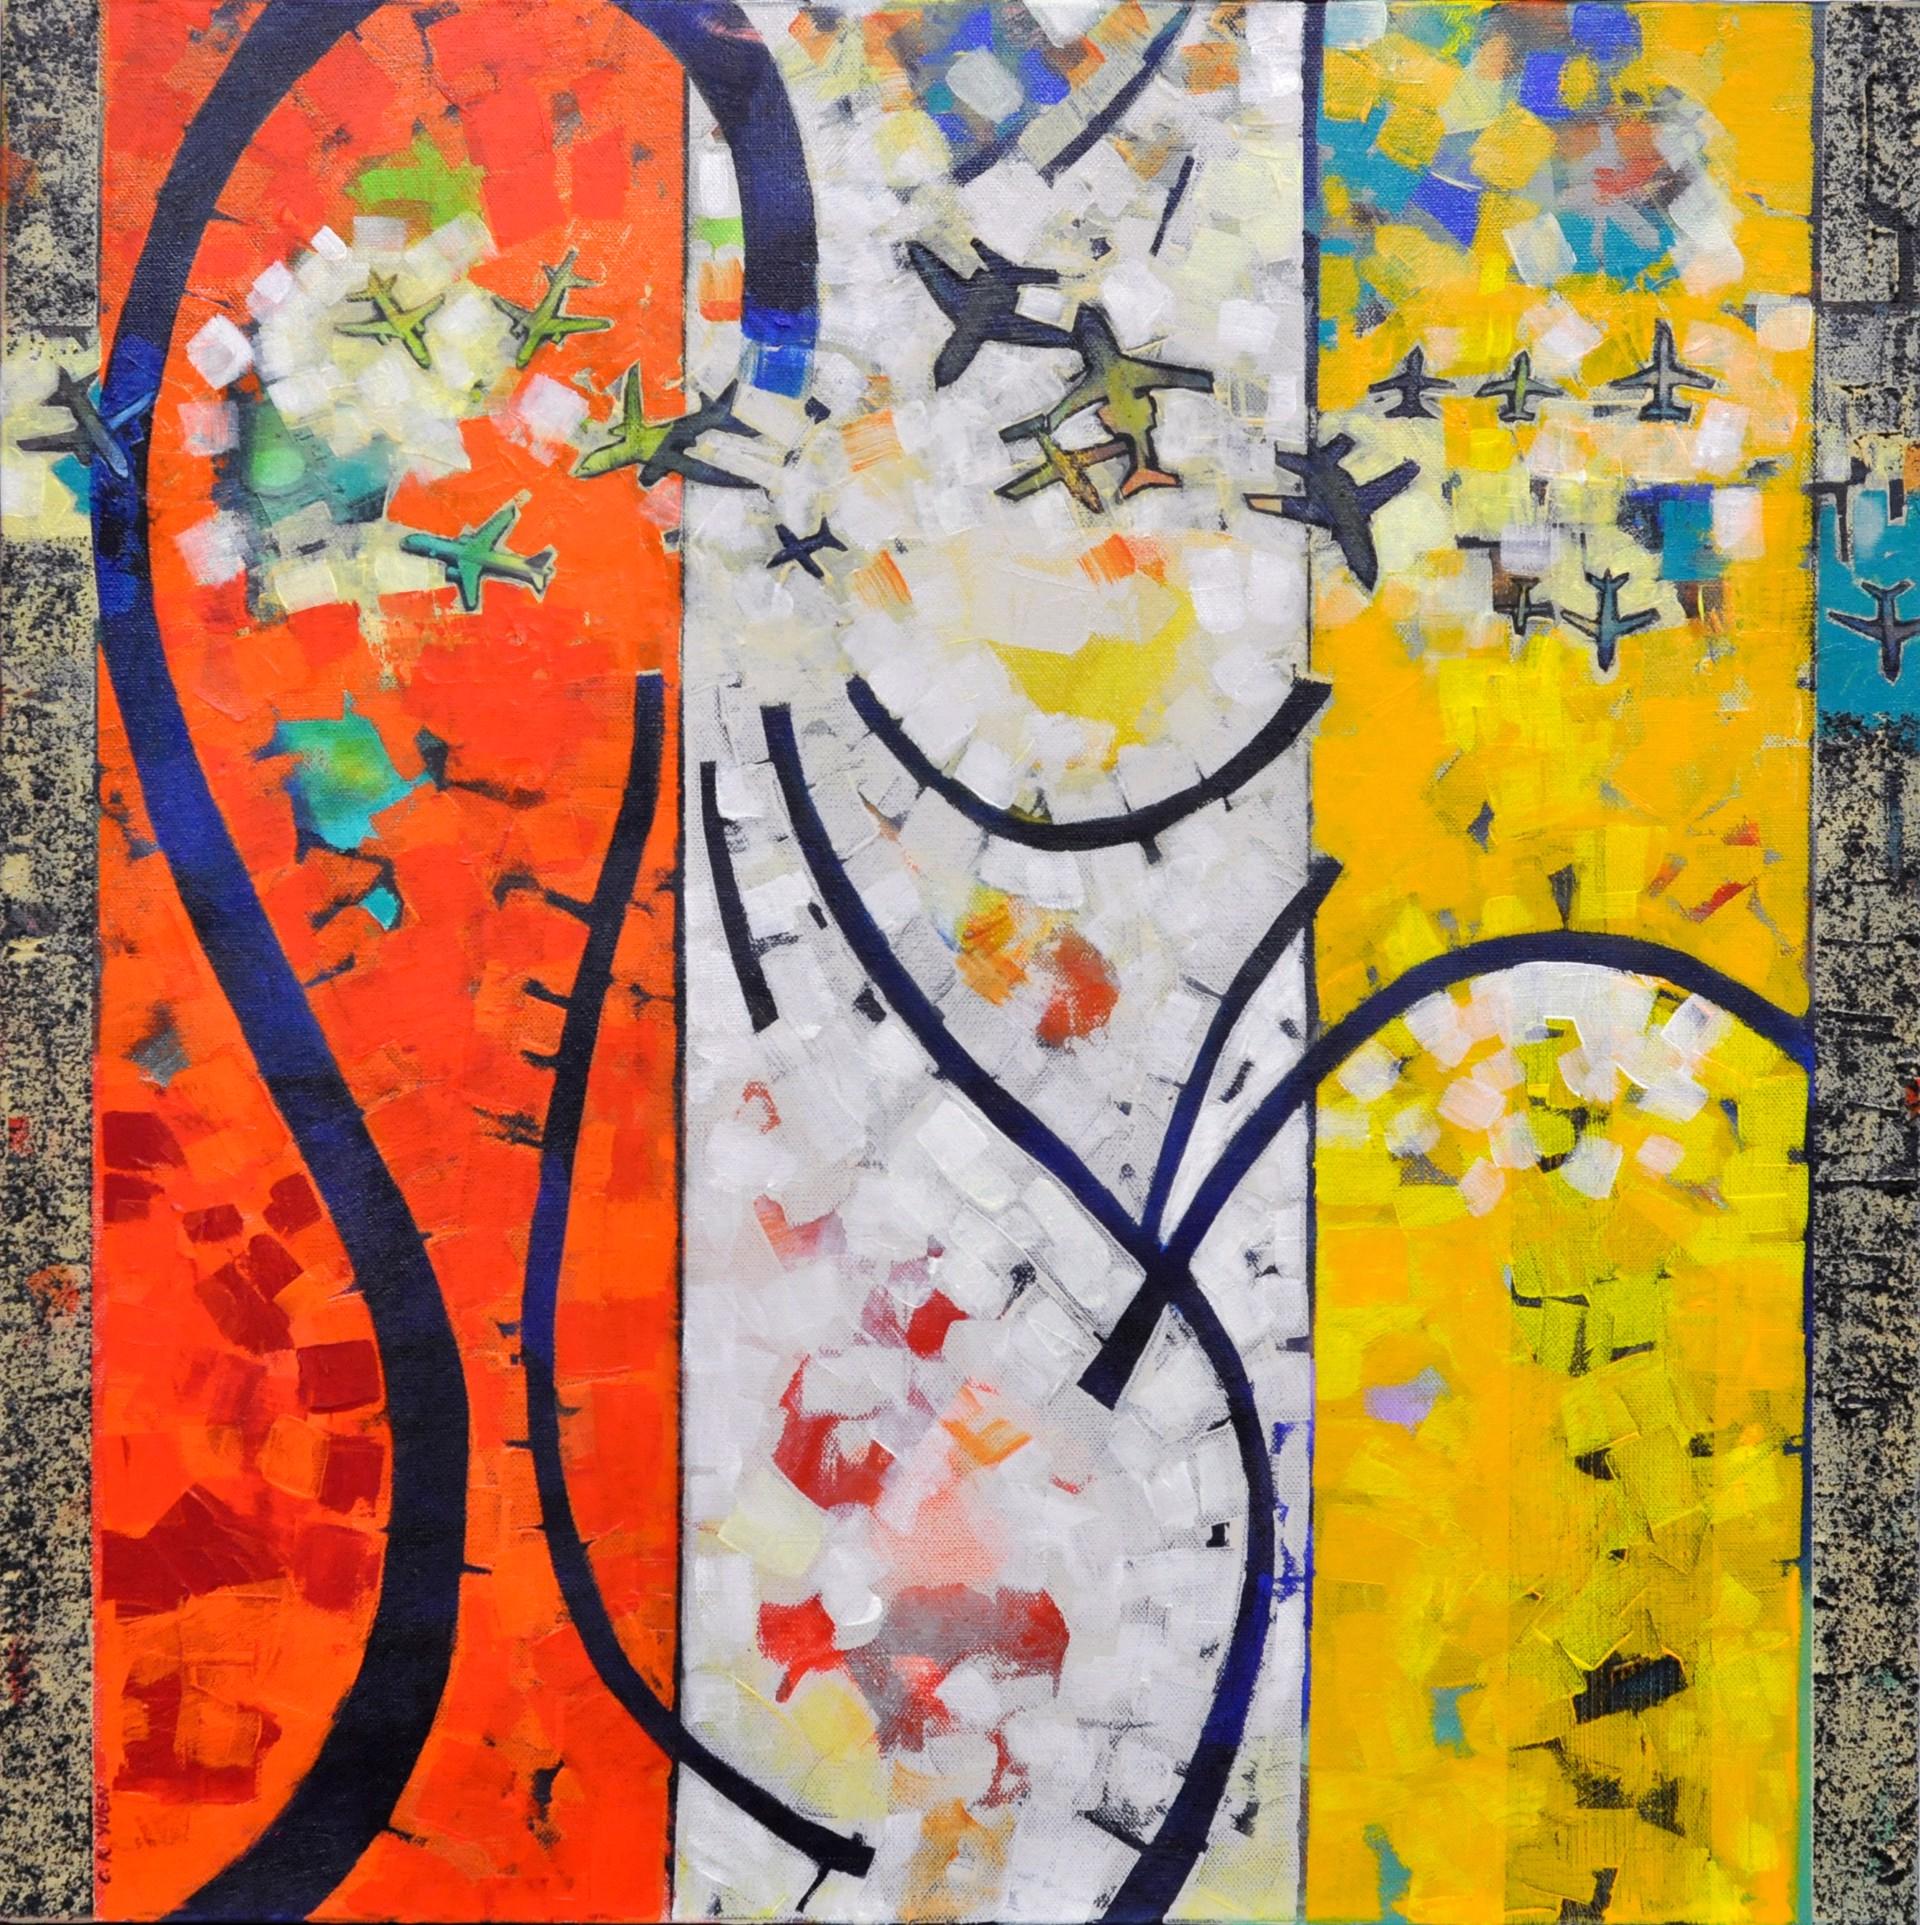 Flight Paths by Chin Yuen